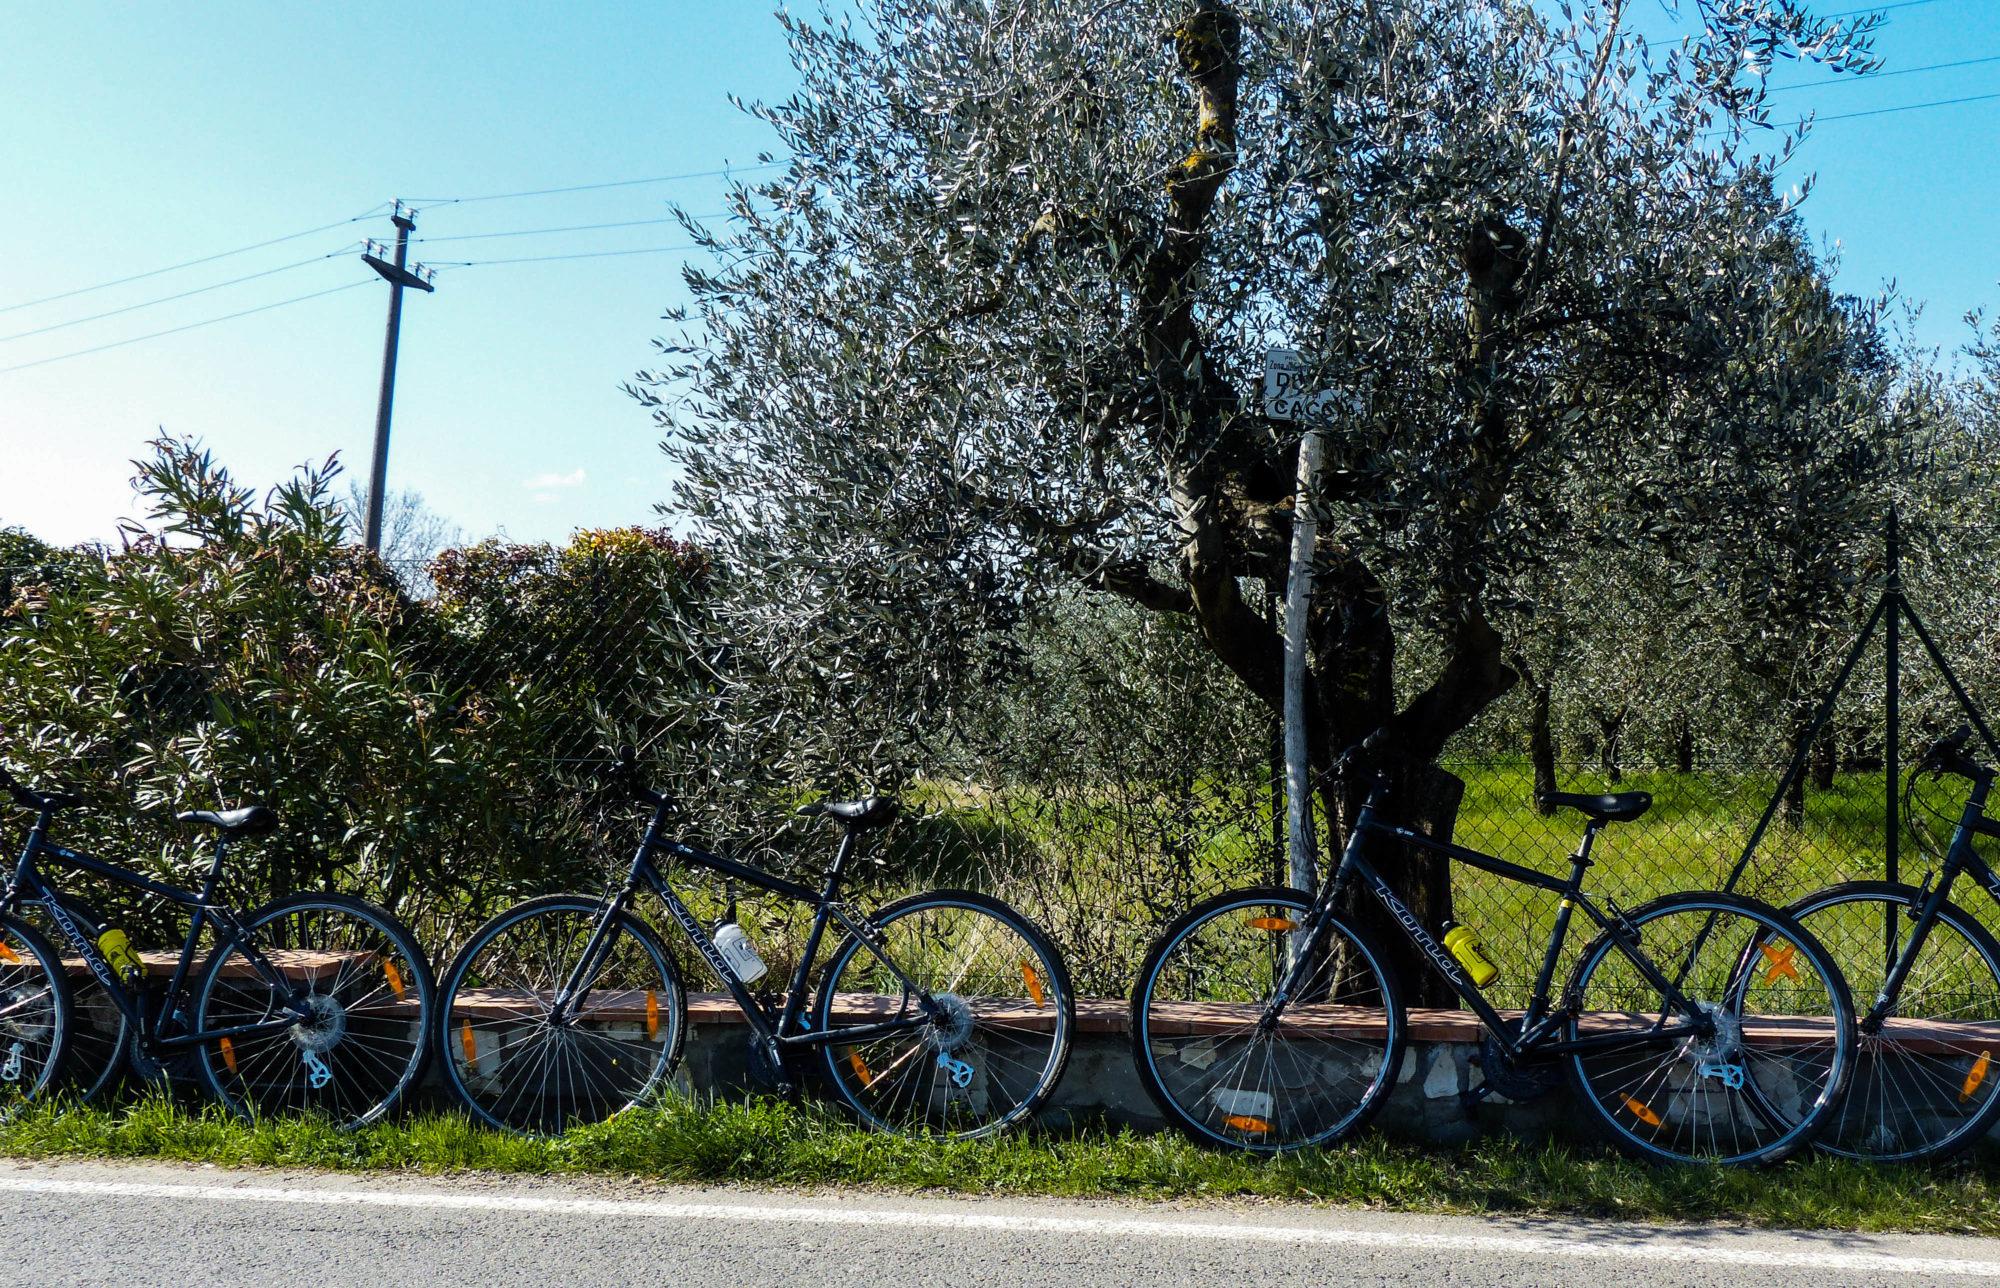 IBIke Italy wine tours